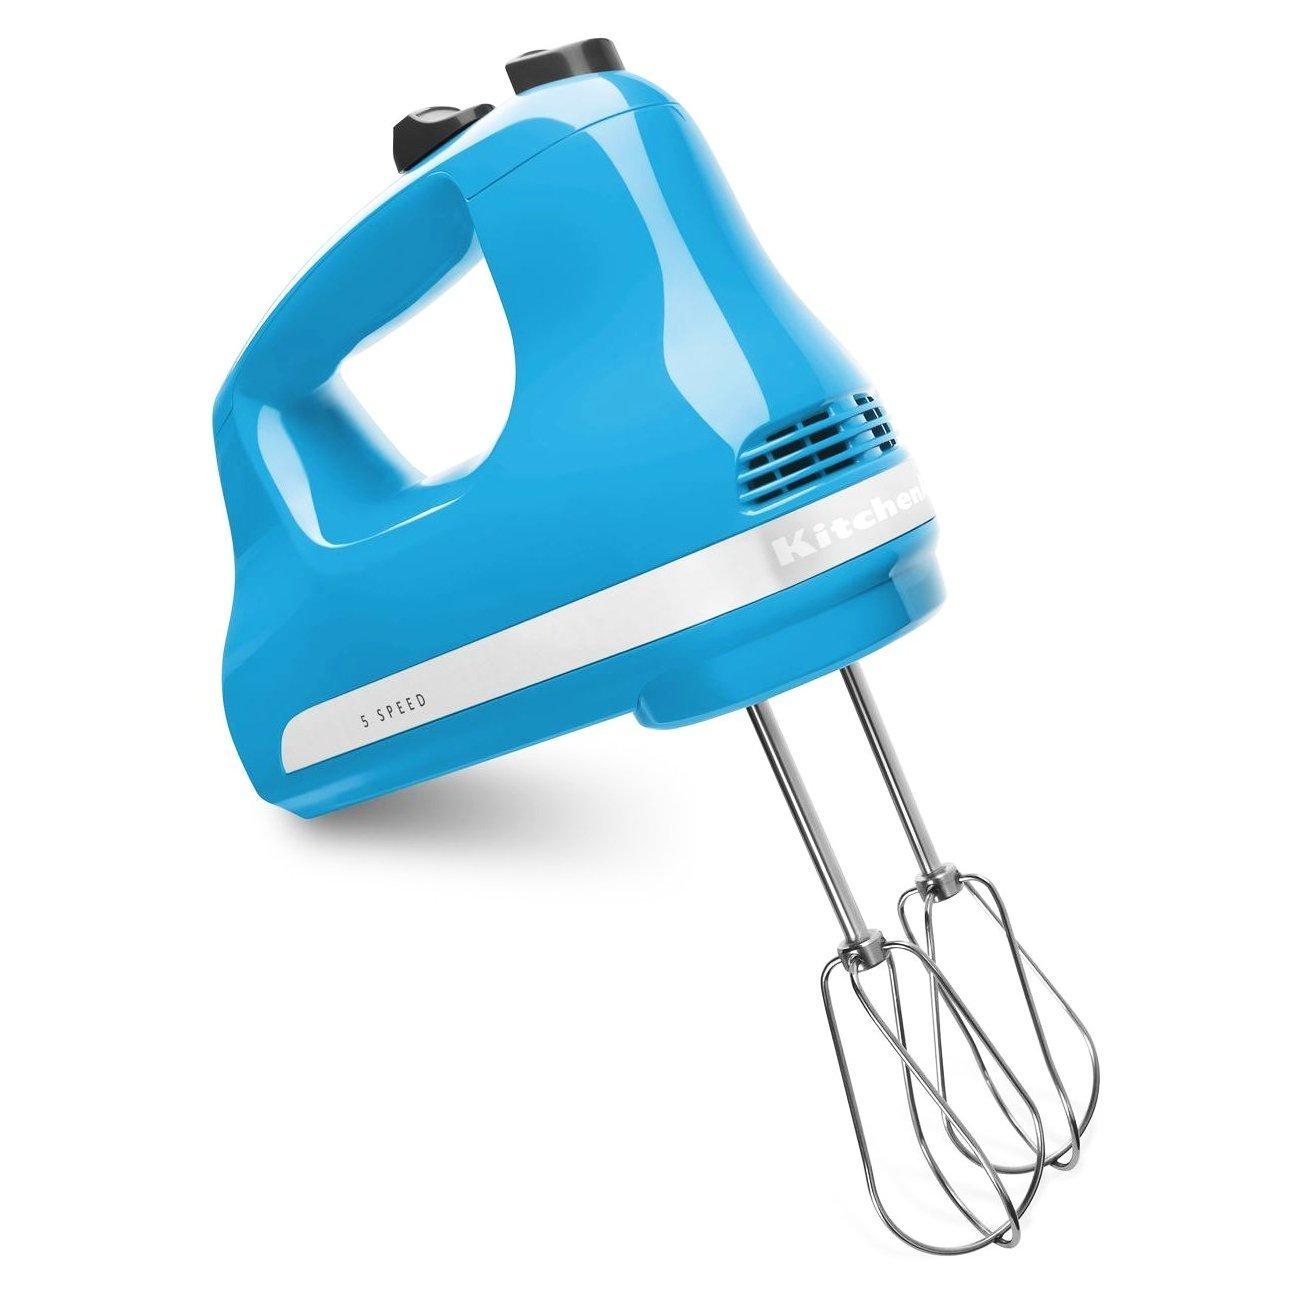 KitchenAid KHM512CL 5-Speed Ultra Power Hand Mixer, Crystal Blue